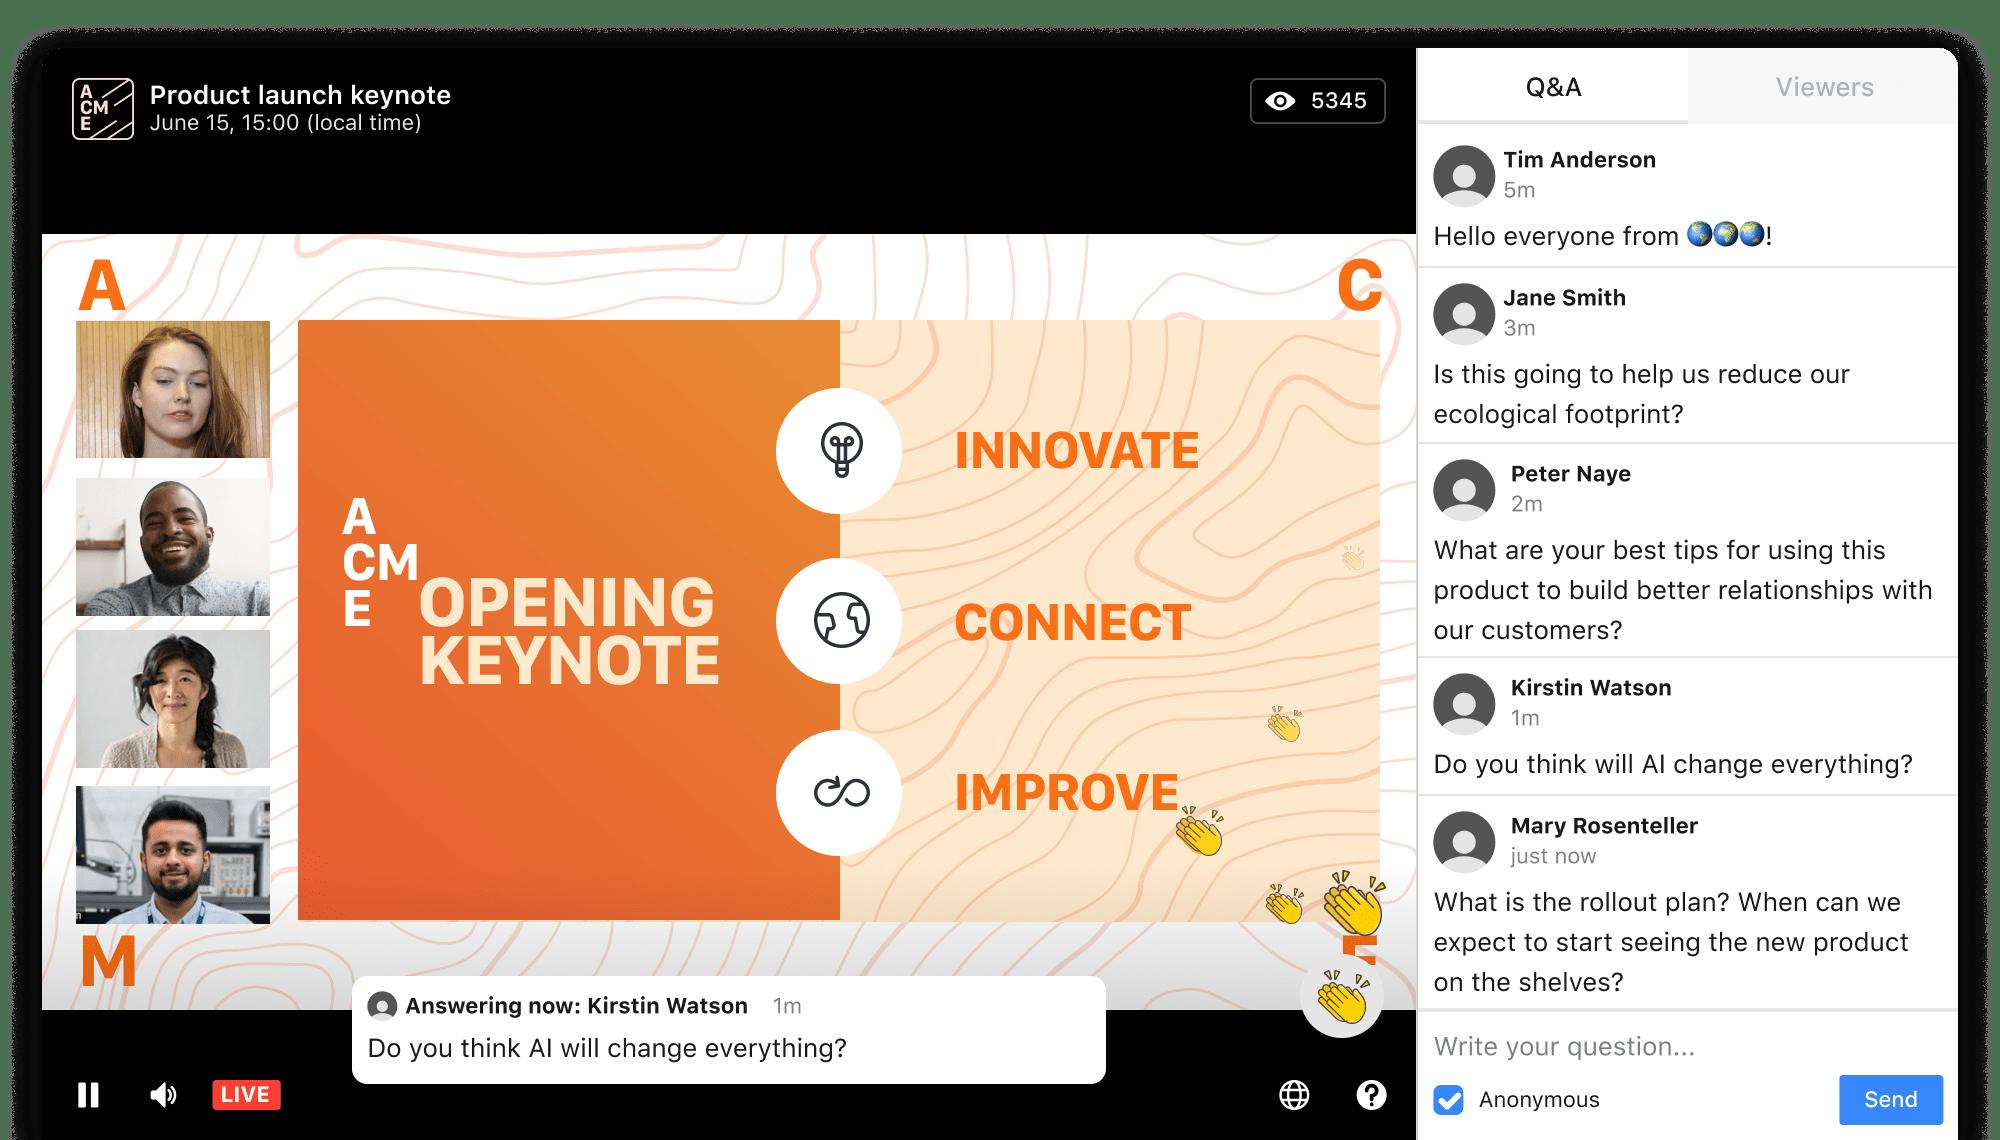 https://spotme.com/wp-content/uploads/2021/06/spotme-express-webinar-screenshot-min.png